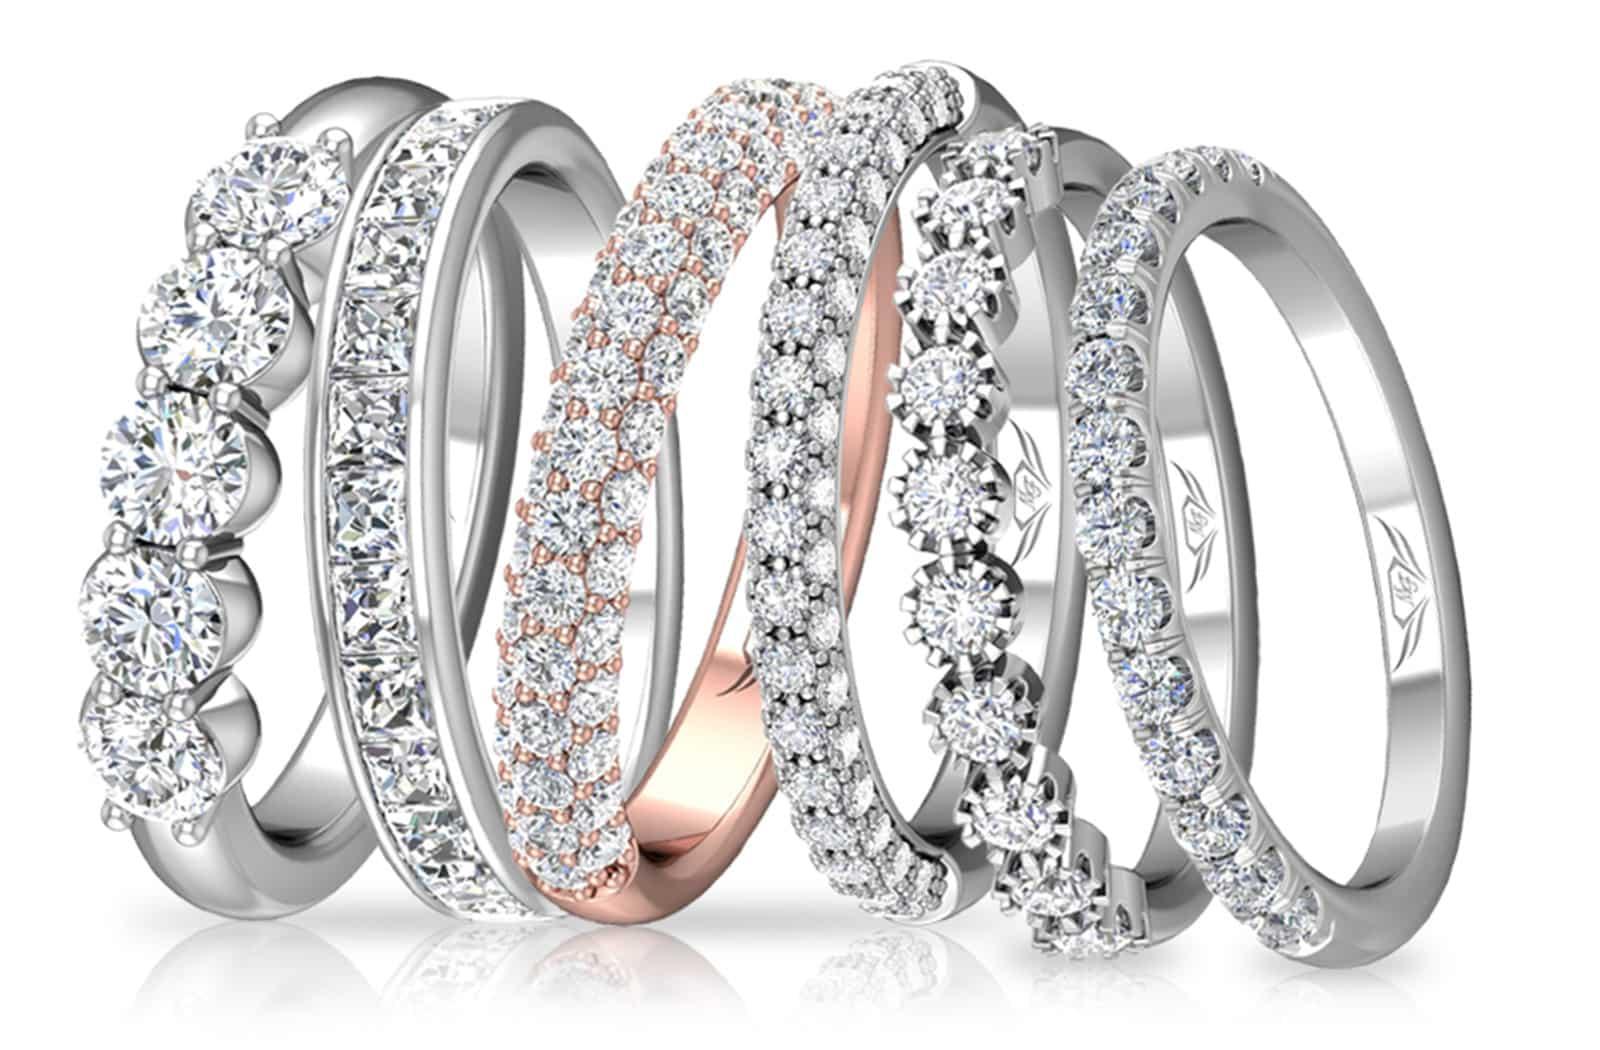 Anniversary Rings Dallas Texas Custom Diamond Rings Dallas 1, Shira Diamonds